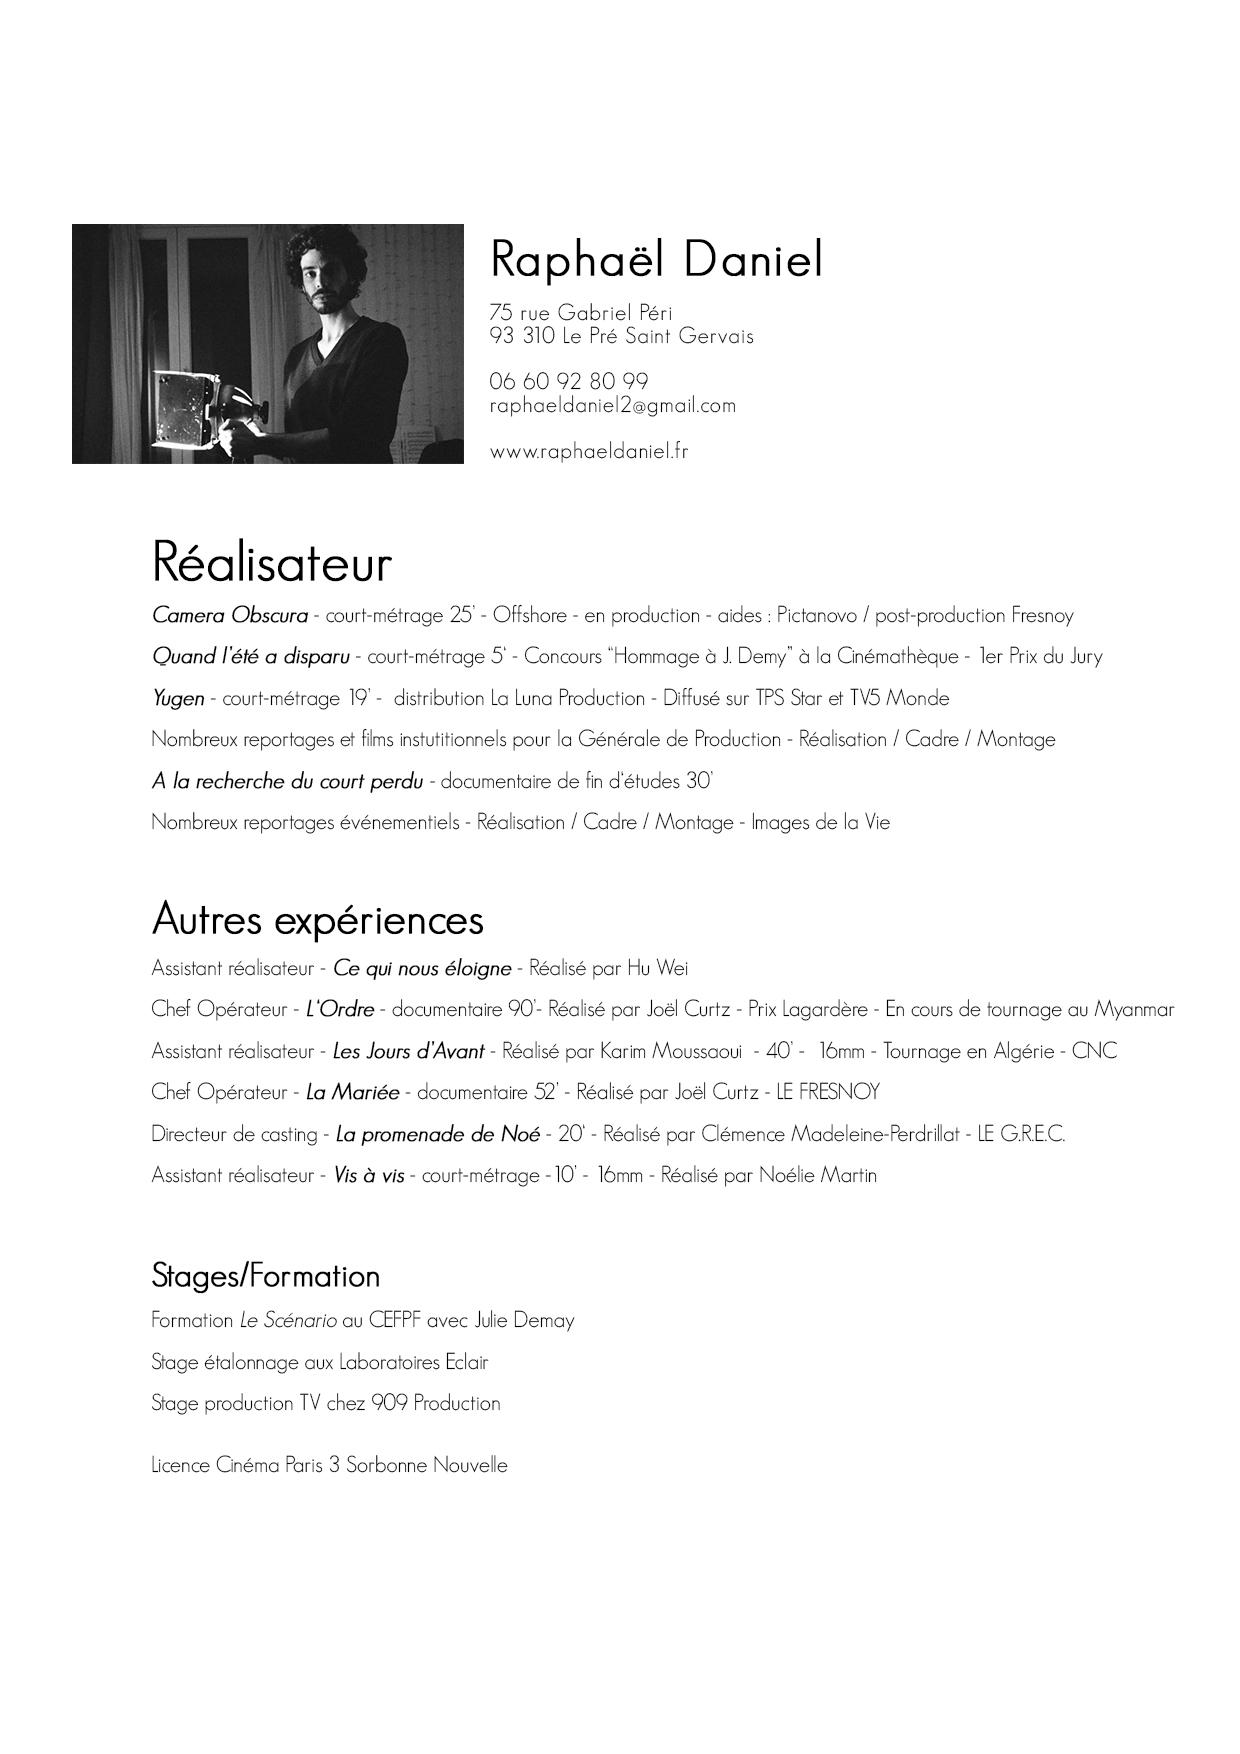 CV Raphael-ciné2017